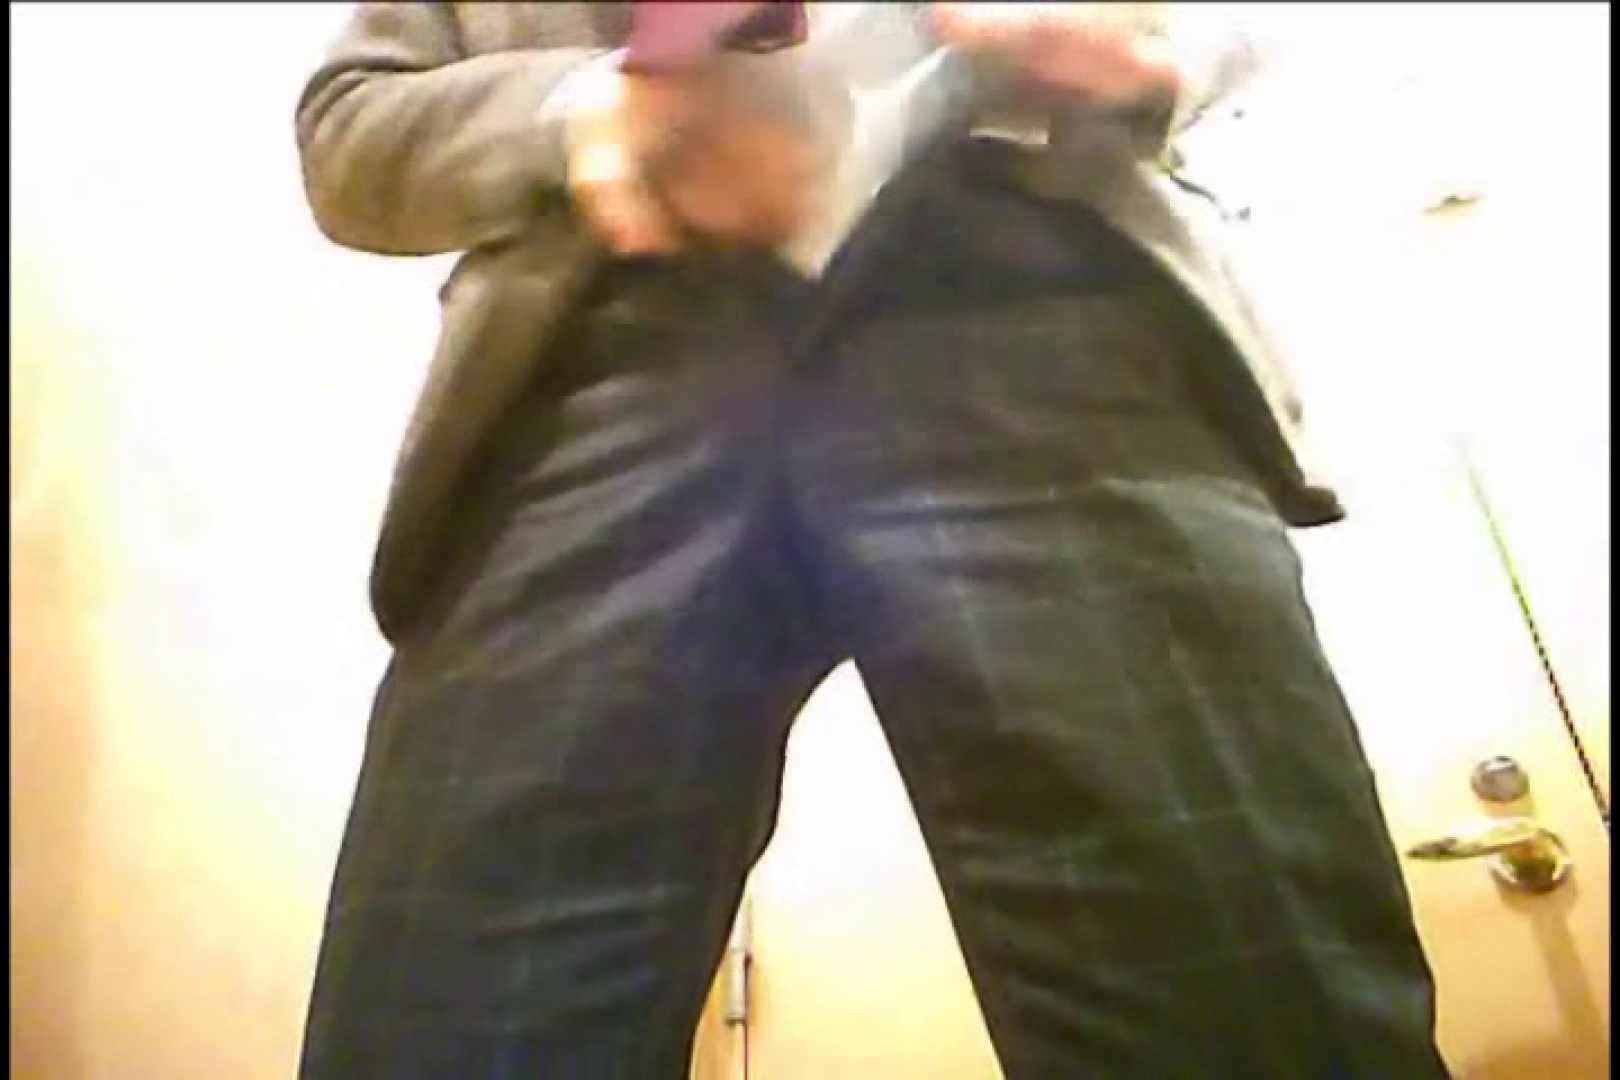 Gボーイ初投稿!掴み取りさんの洗面所覗き!in新幹線!VOL.04 覗きシーン ゲイ丸見え画像 65枚 6